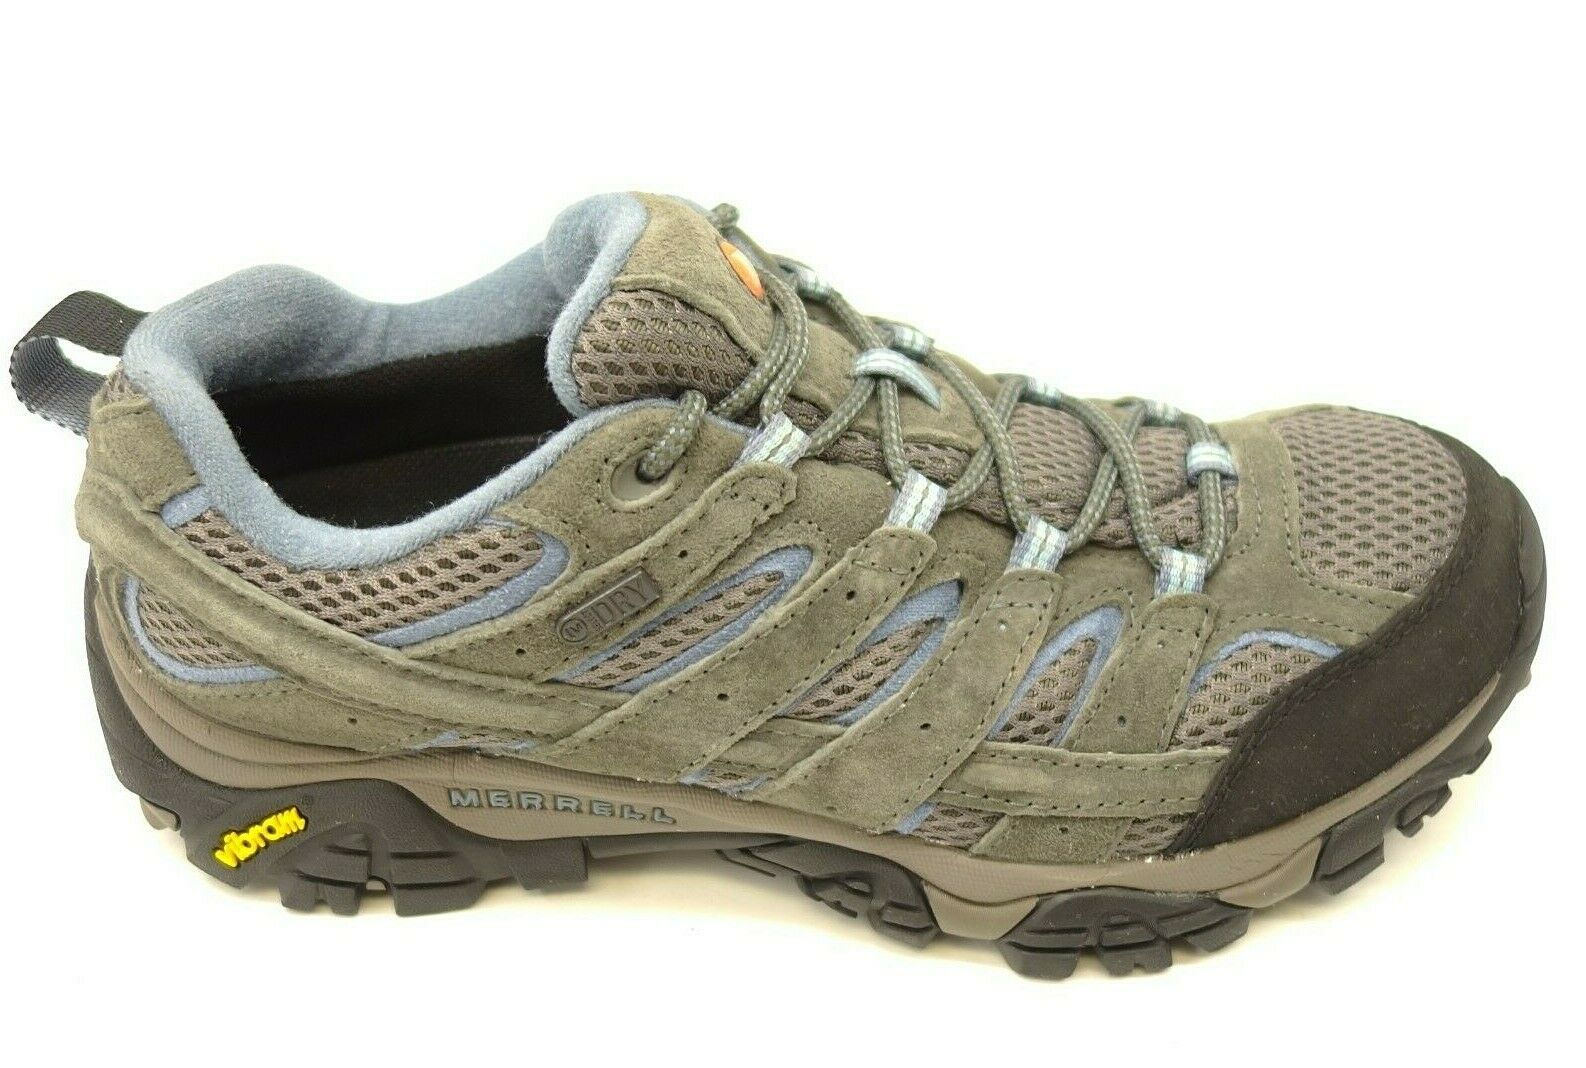 Merrell Moab 2 Sz 9 Low Granite Hiking Waterproof Athletic Womens shoes